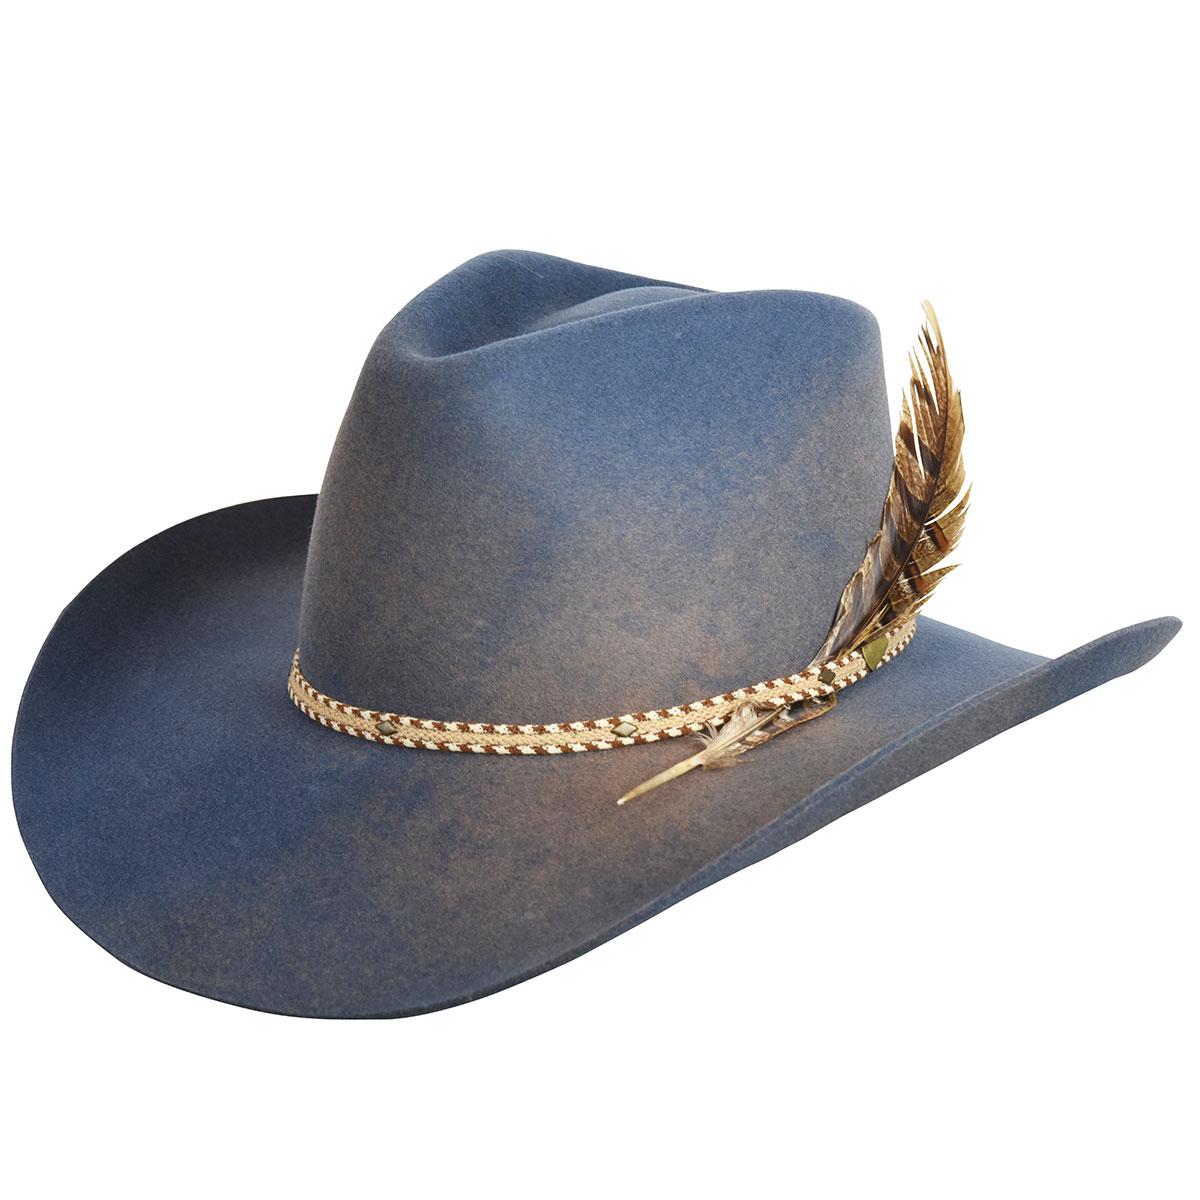 Renegade Renegade by Bailey Lucius Western Hat in New Slate,Mole Swirl